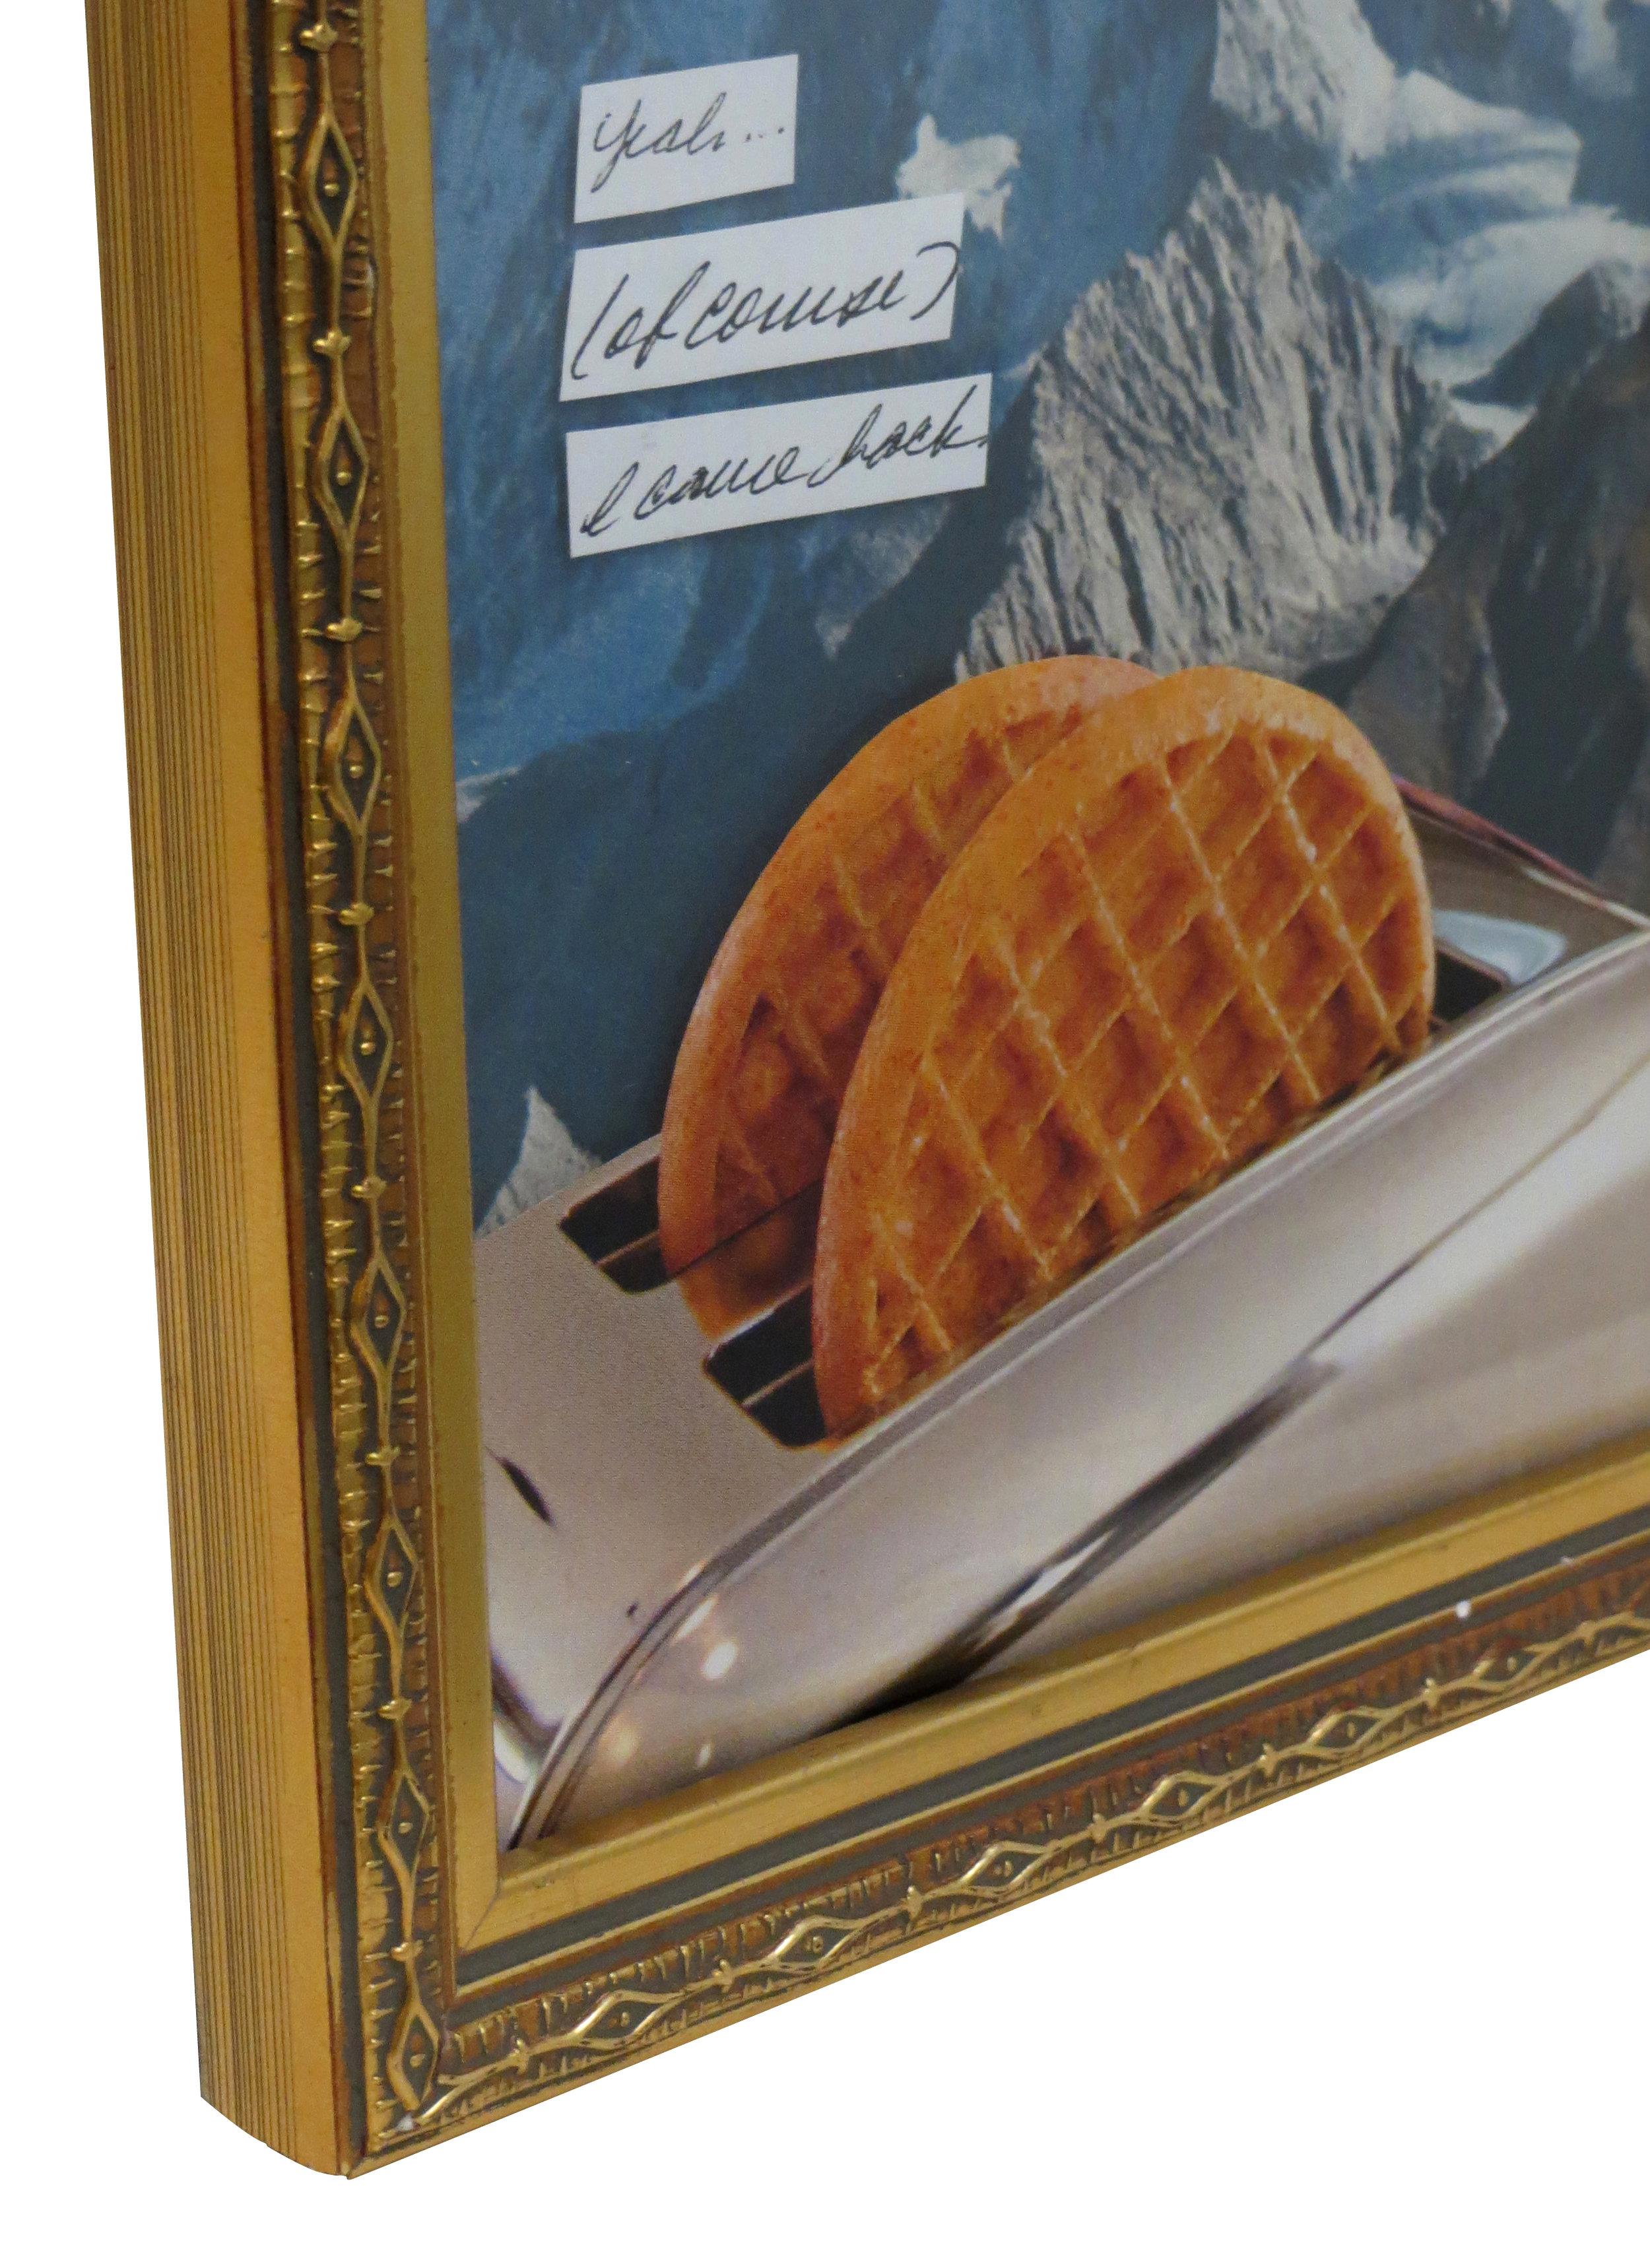 Waffles (detail)